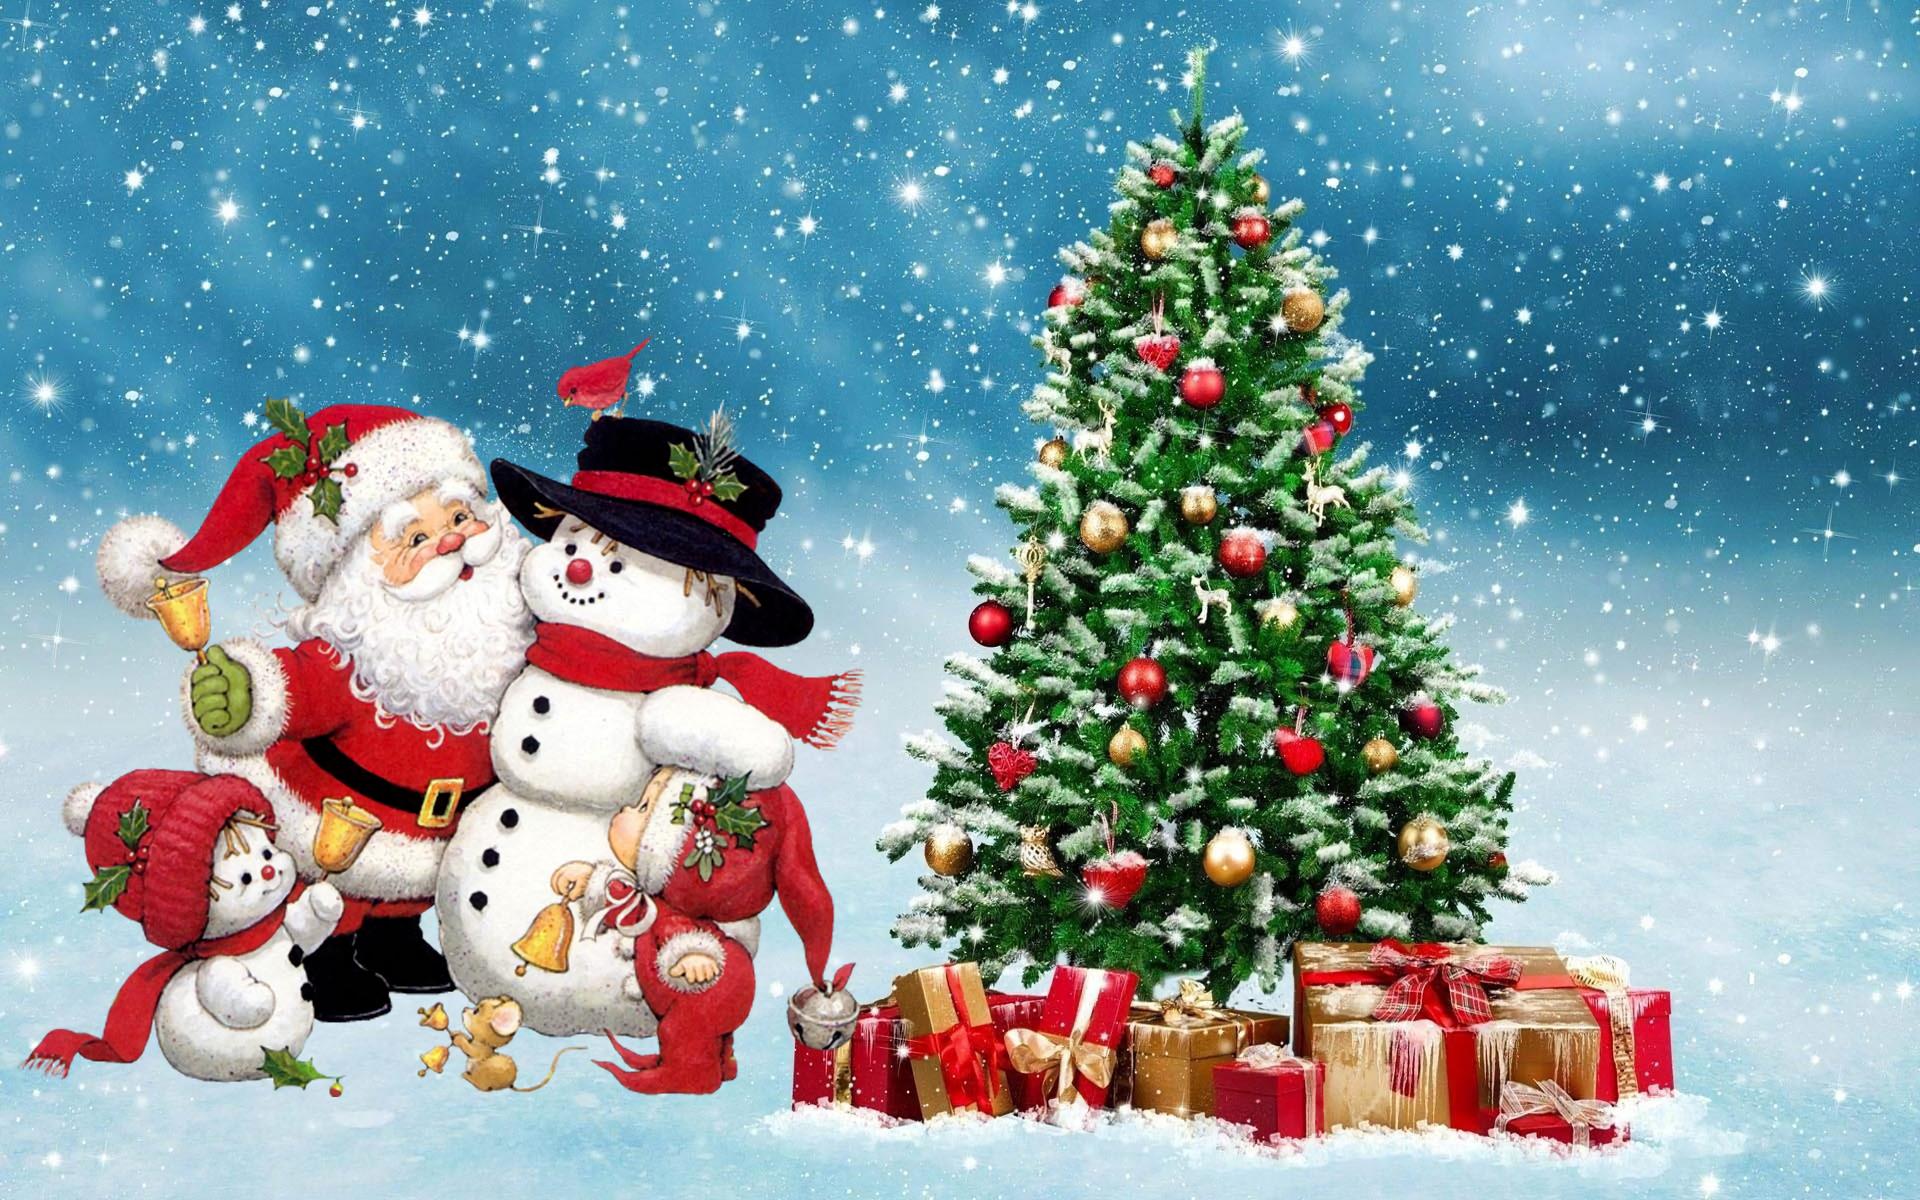 Holiday - Christmas  Holiday Santa Snowman Christmas Tree Snow Wallpaper